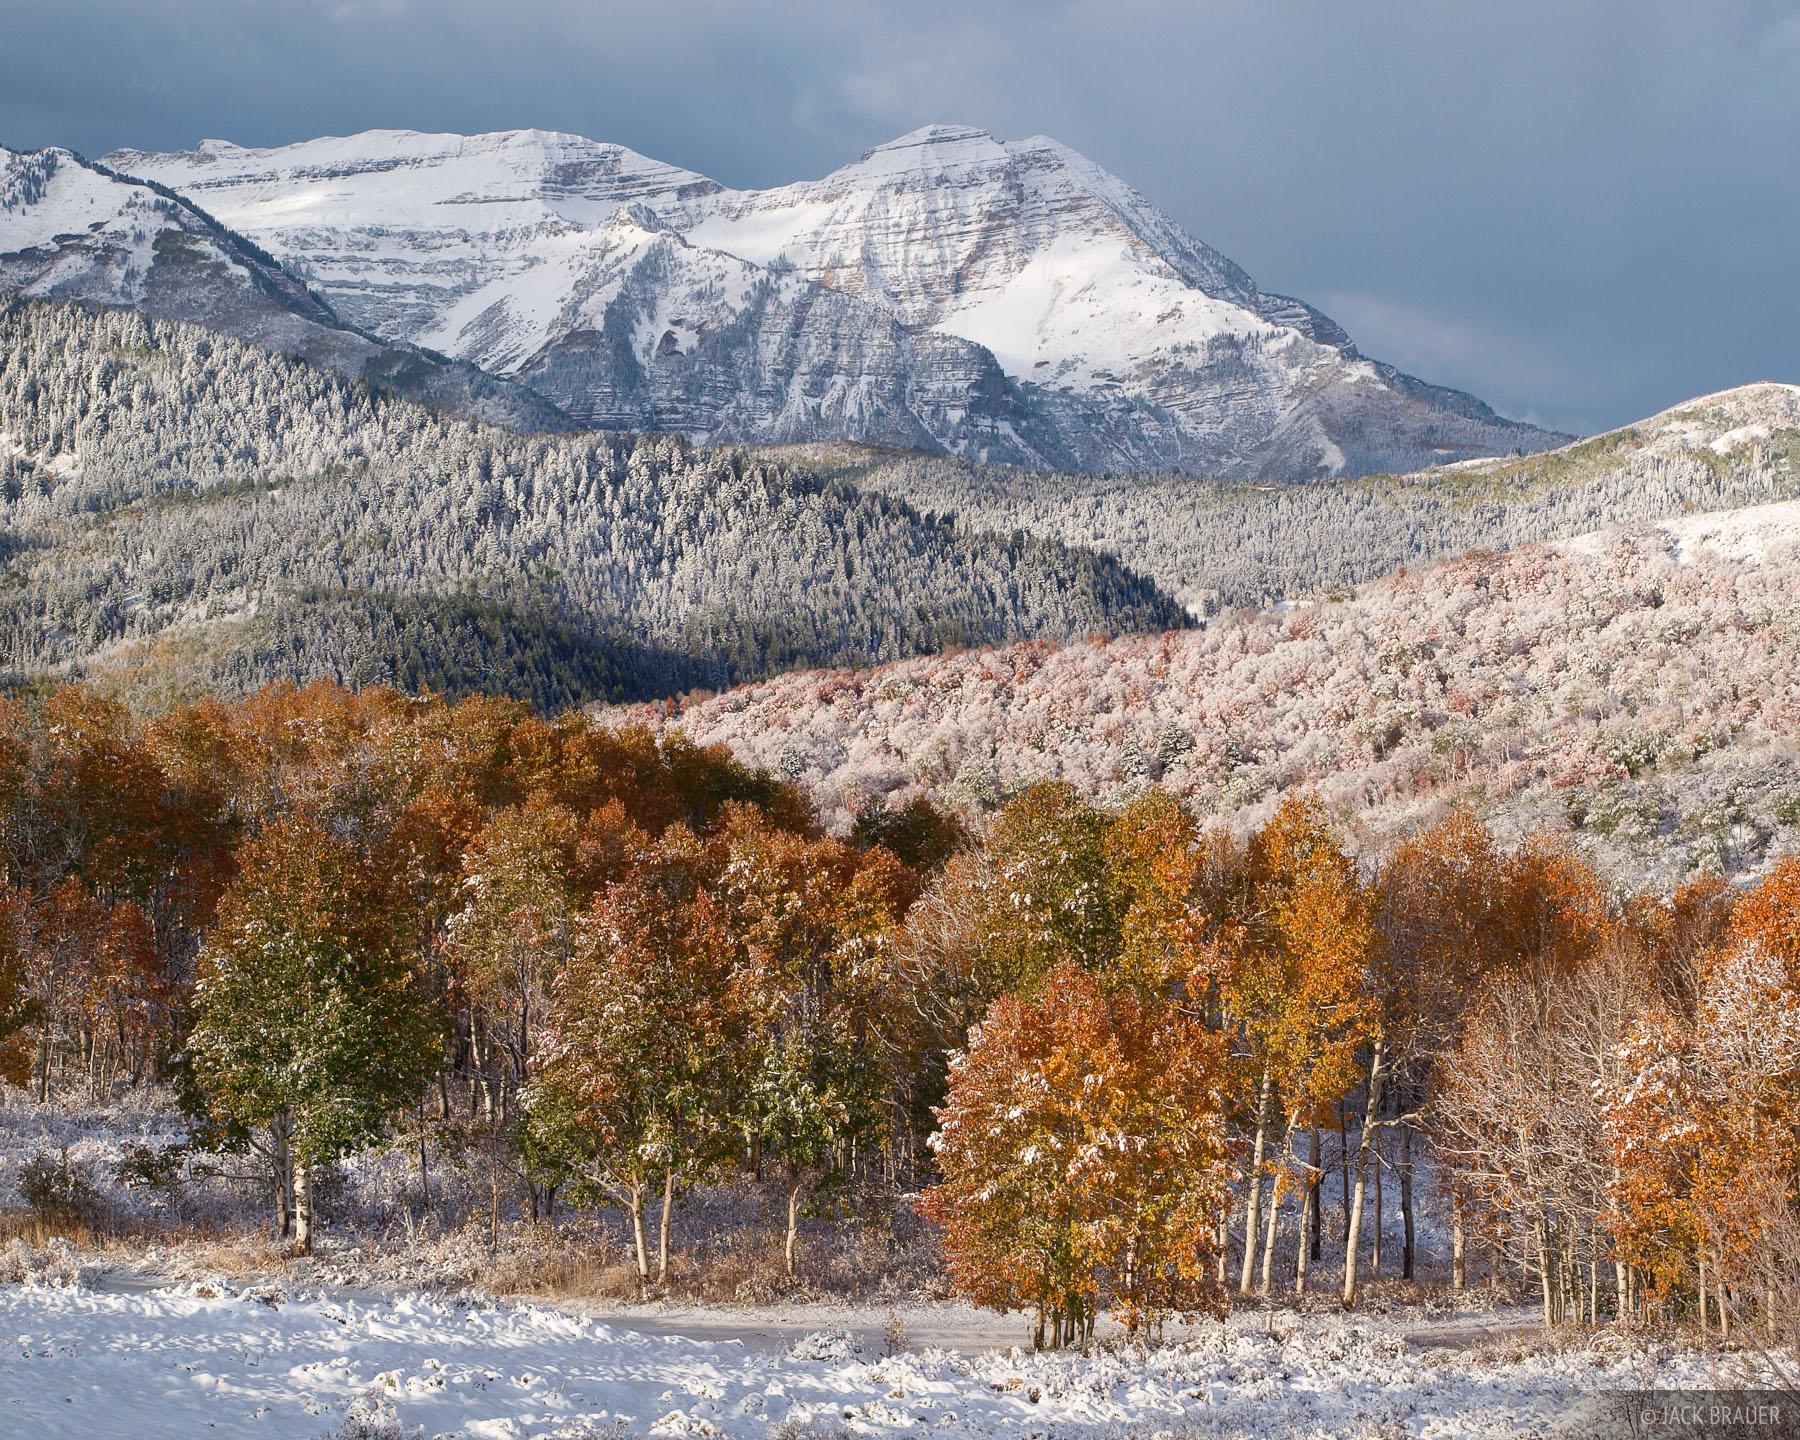 Timpanogos, North Peak, Wasatch, Utah, photo